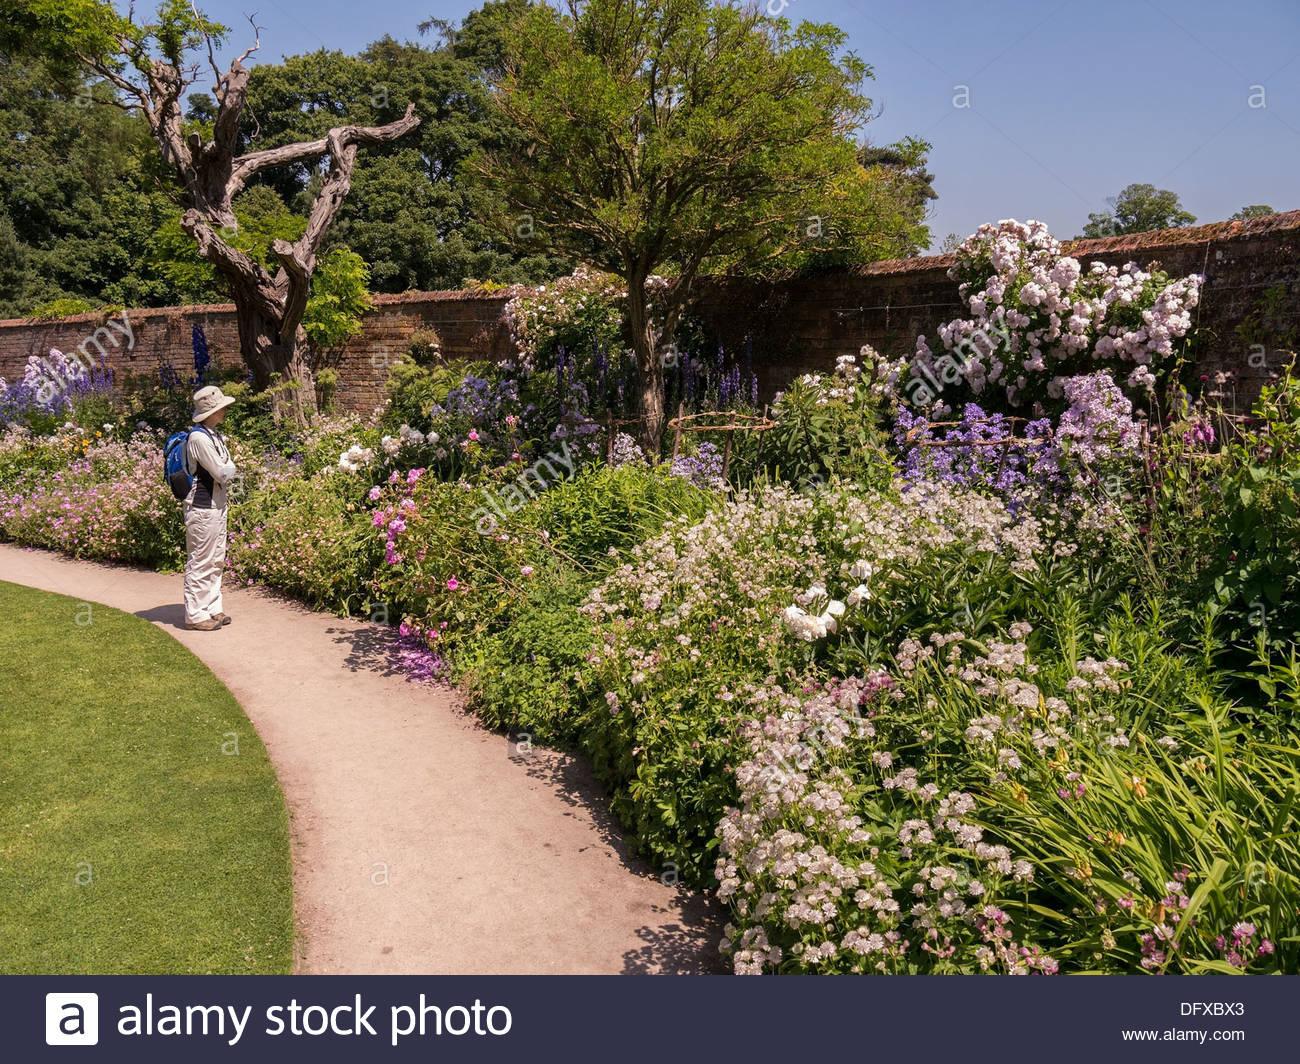 Woman Looking At Flowering Plants In Deep Flower Bed Border In Walled Garden  At Calke Abbey, Ticknall, Derbyshire. England, UK